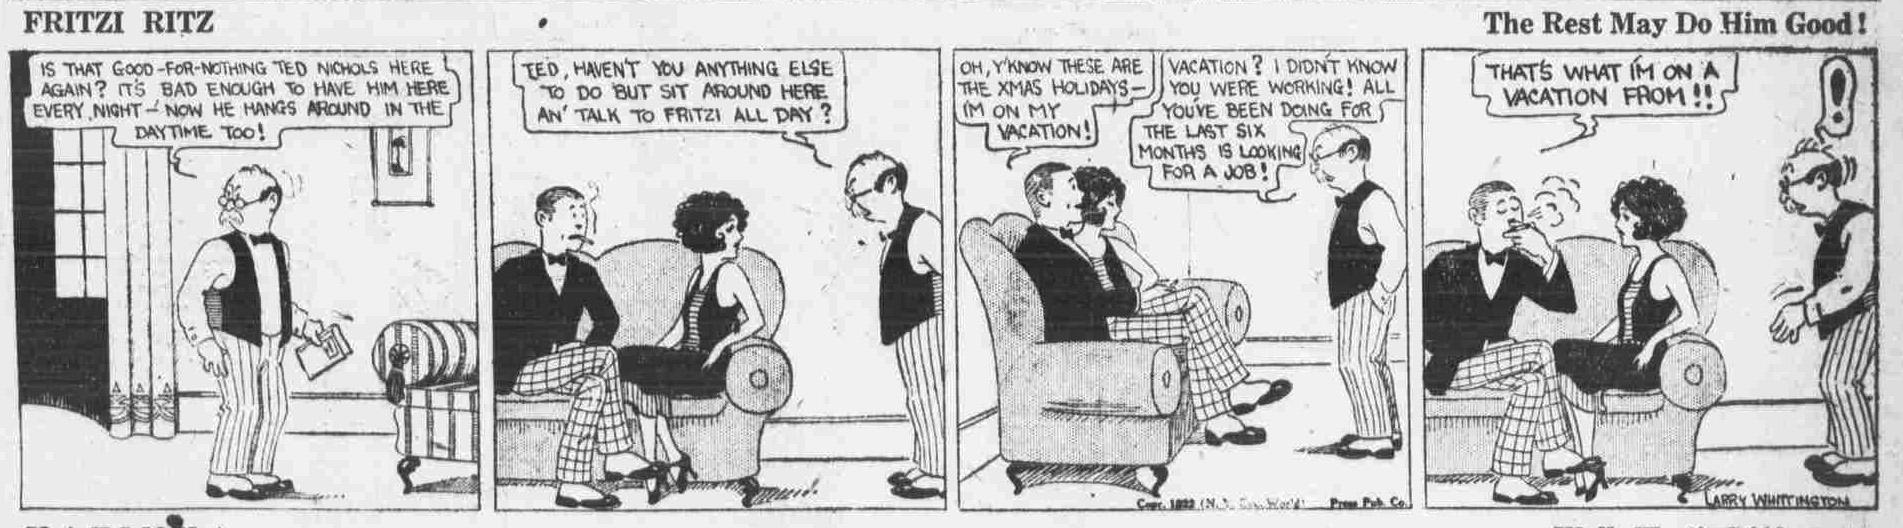 Dec. 29, 1922